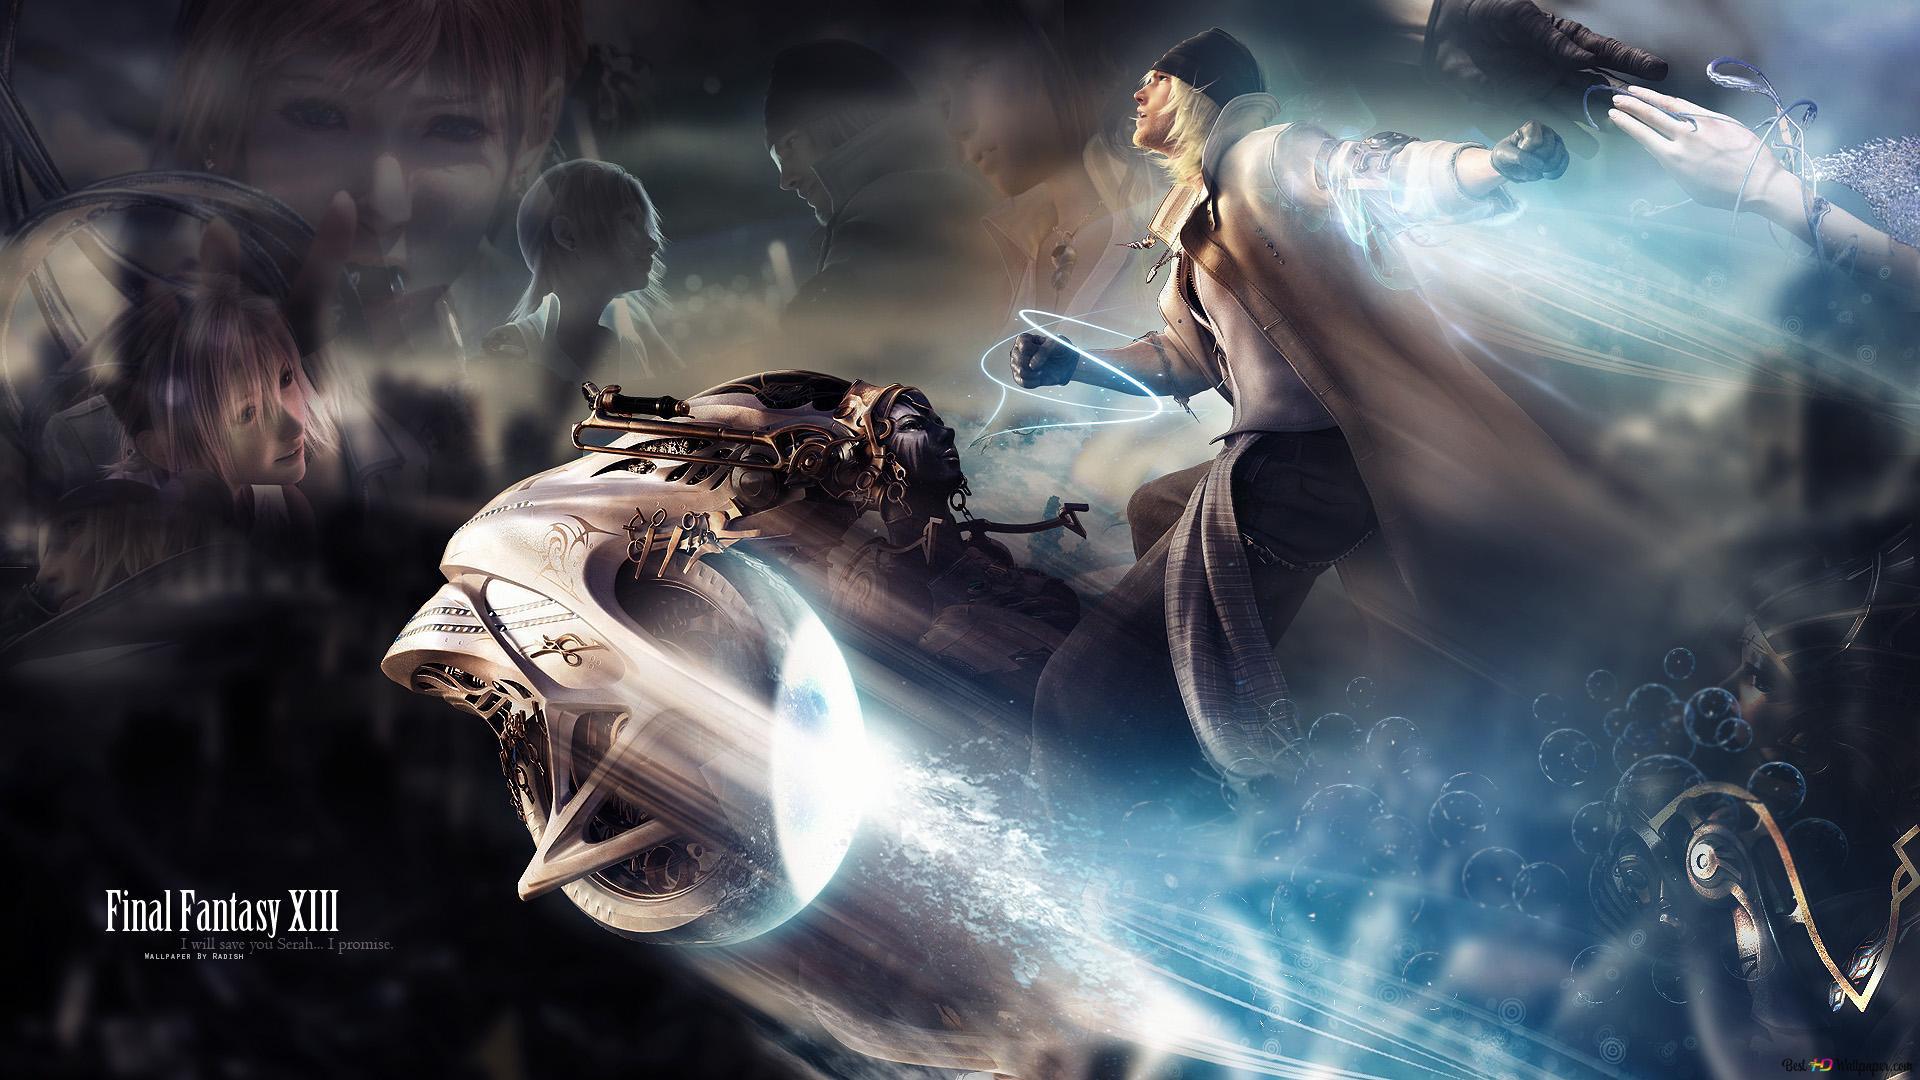 Final Fantasy Xiii Hd Wallpaper Download